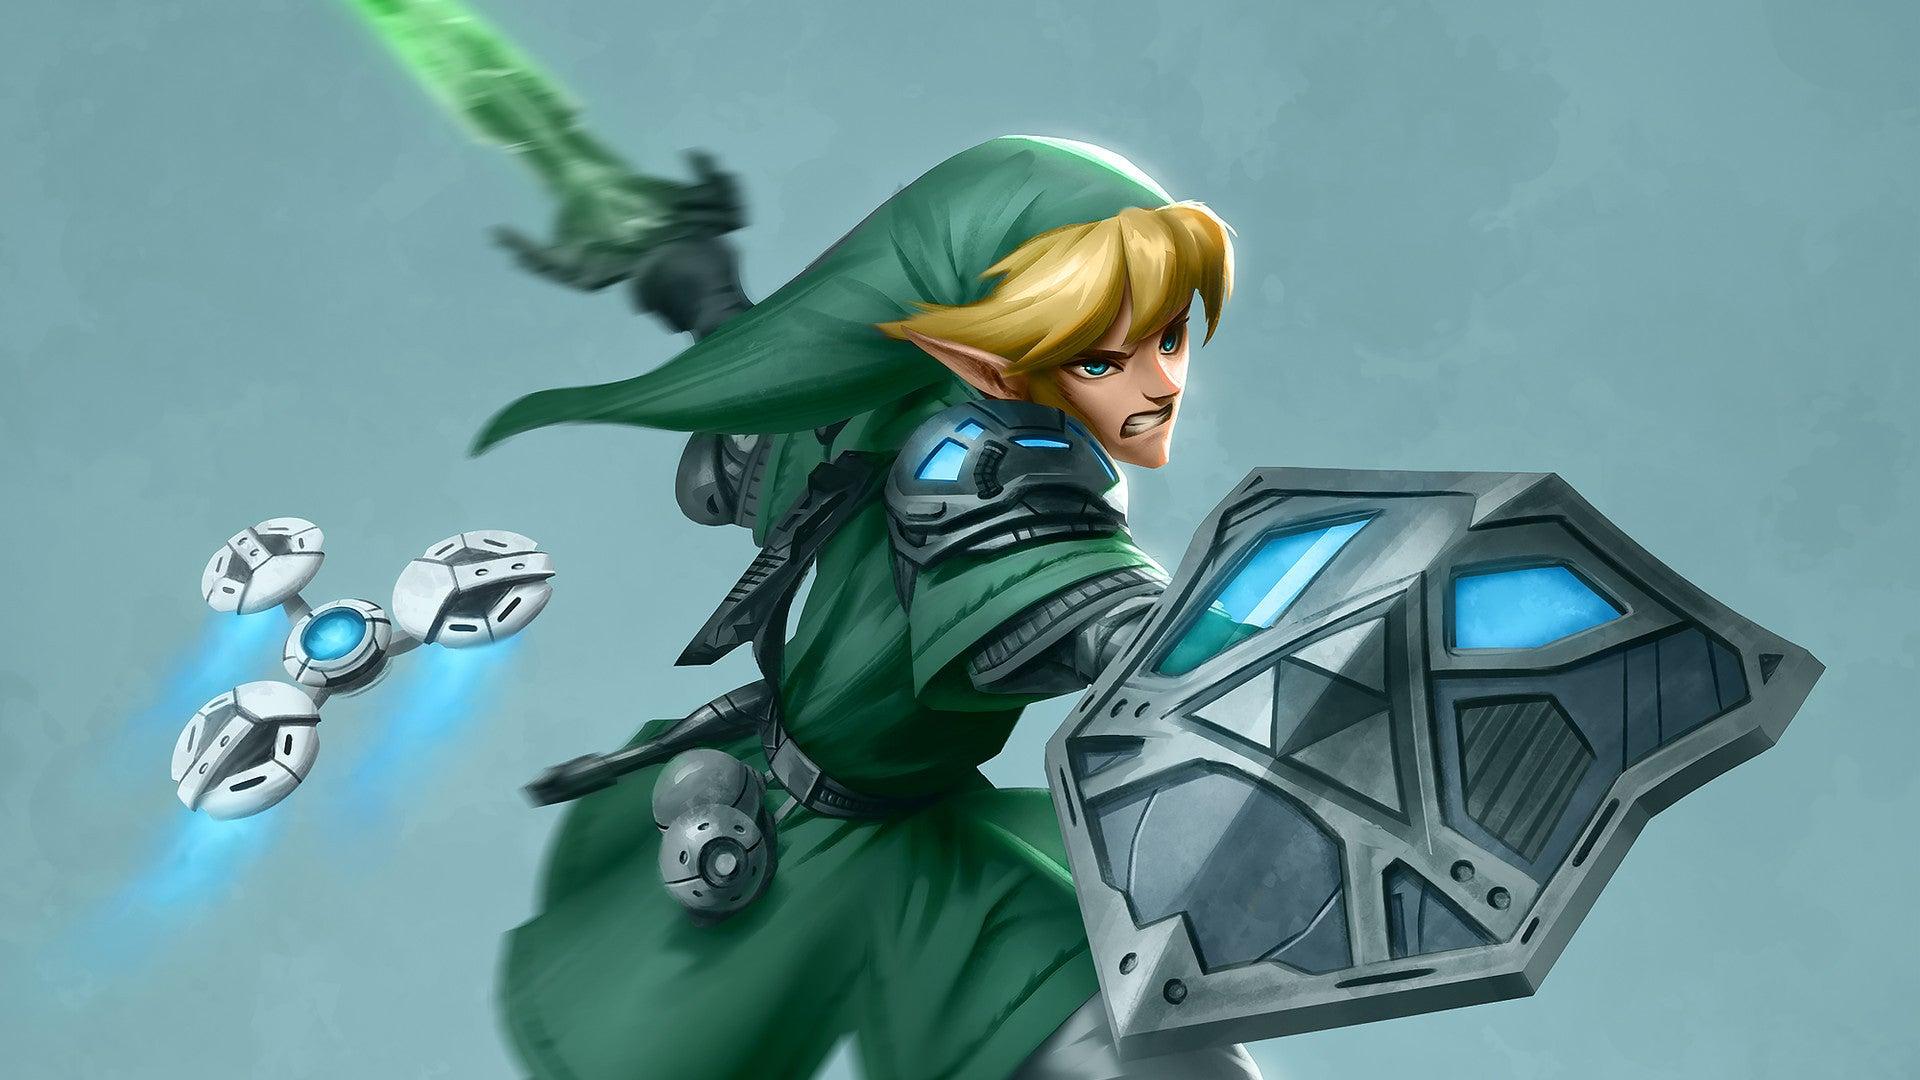 art character-art dayshot fanart link sci-fi scifi zelda